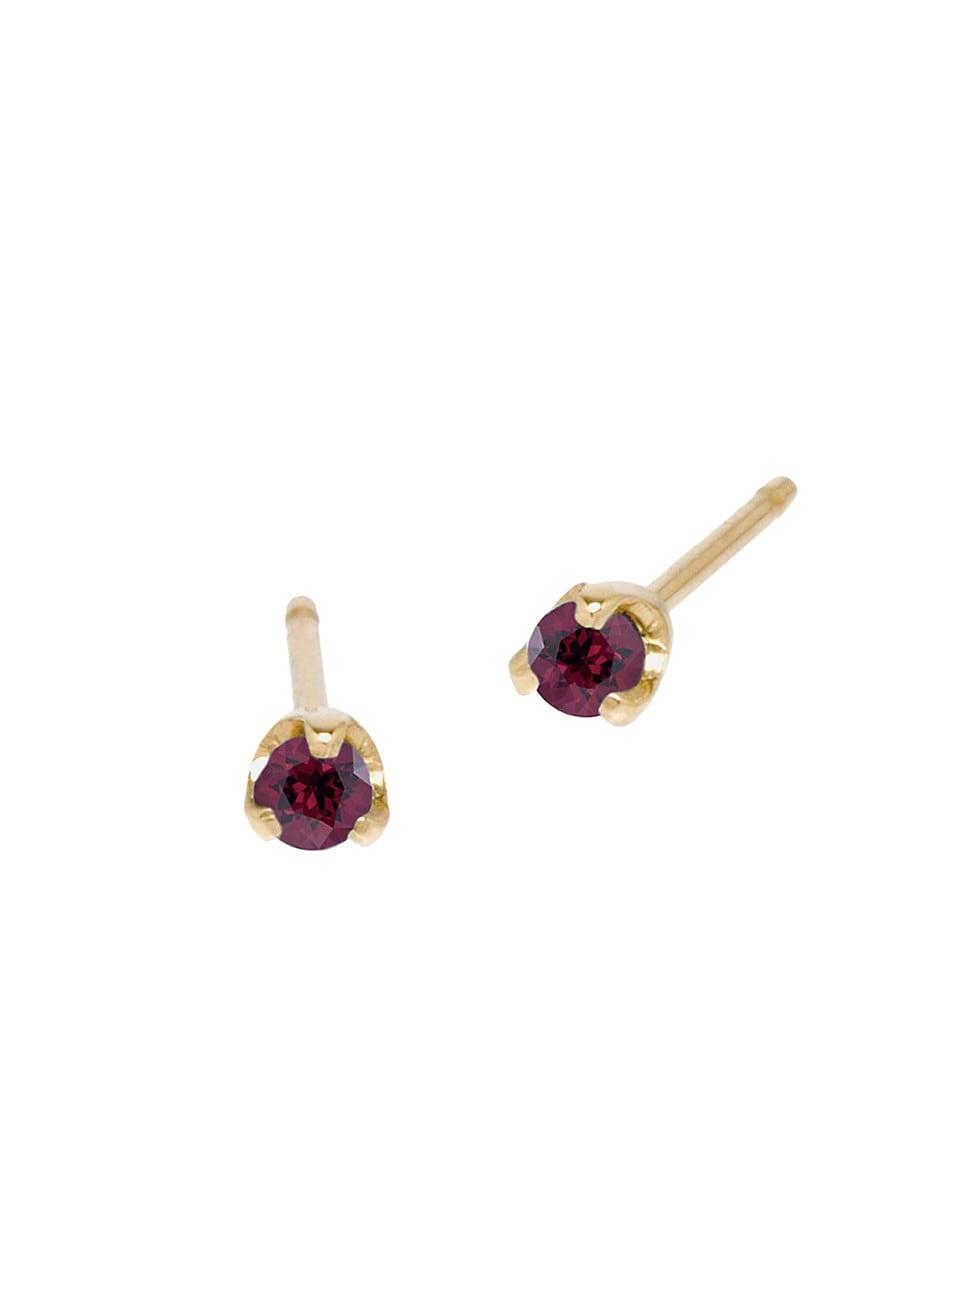 Zoë Chicco Women's Birthstones 14k Yellow Gold & Garnet Stud Earrings